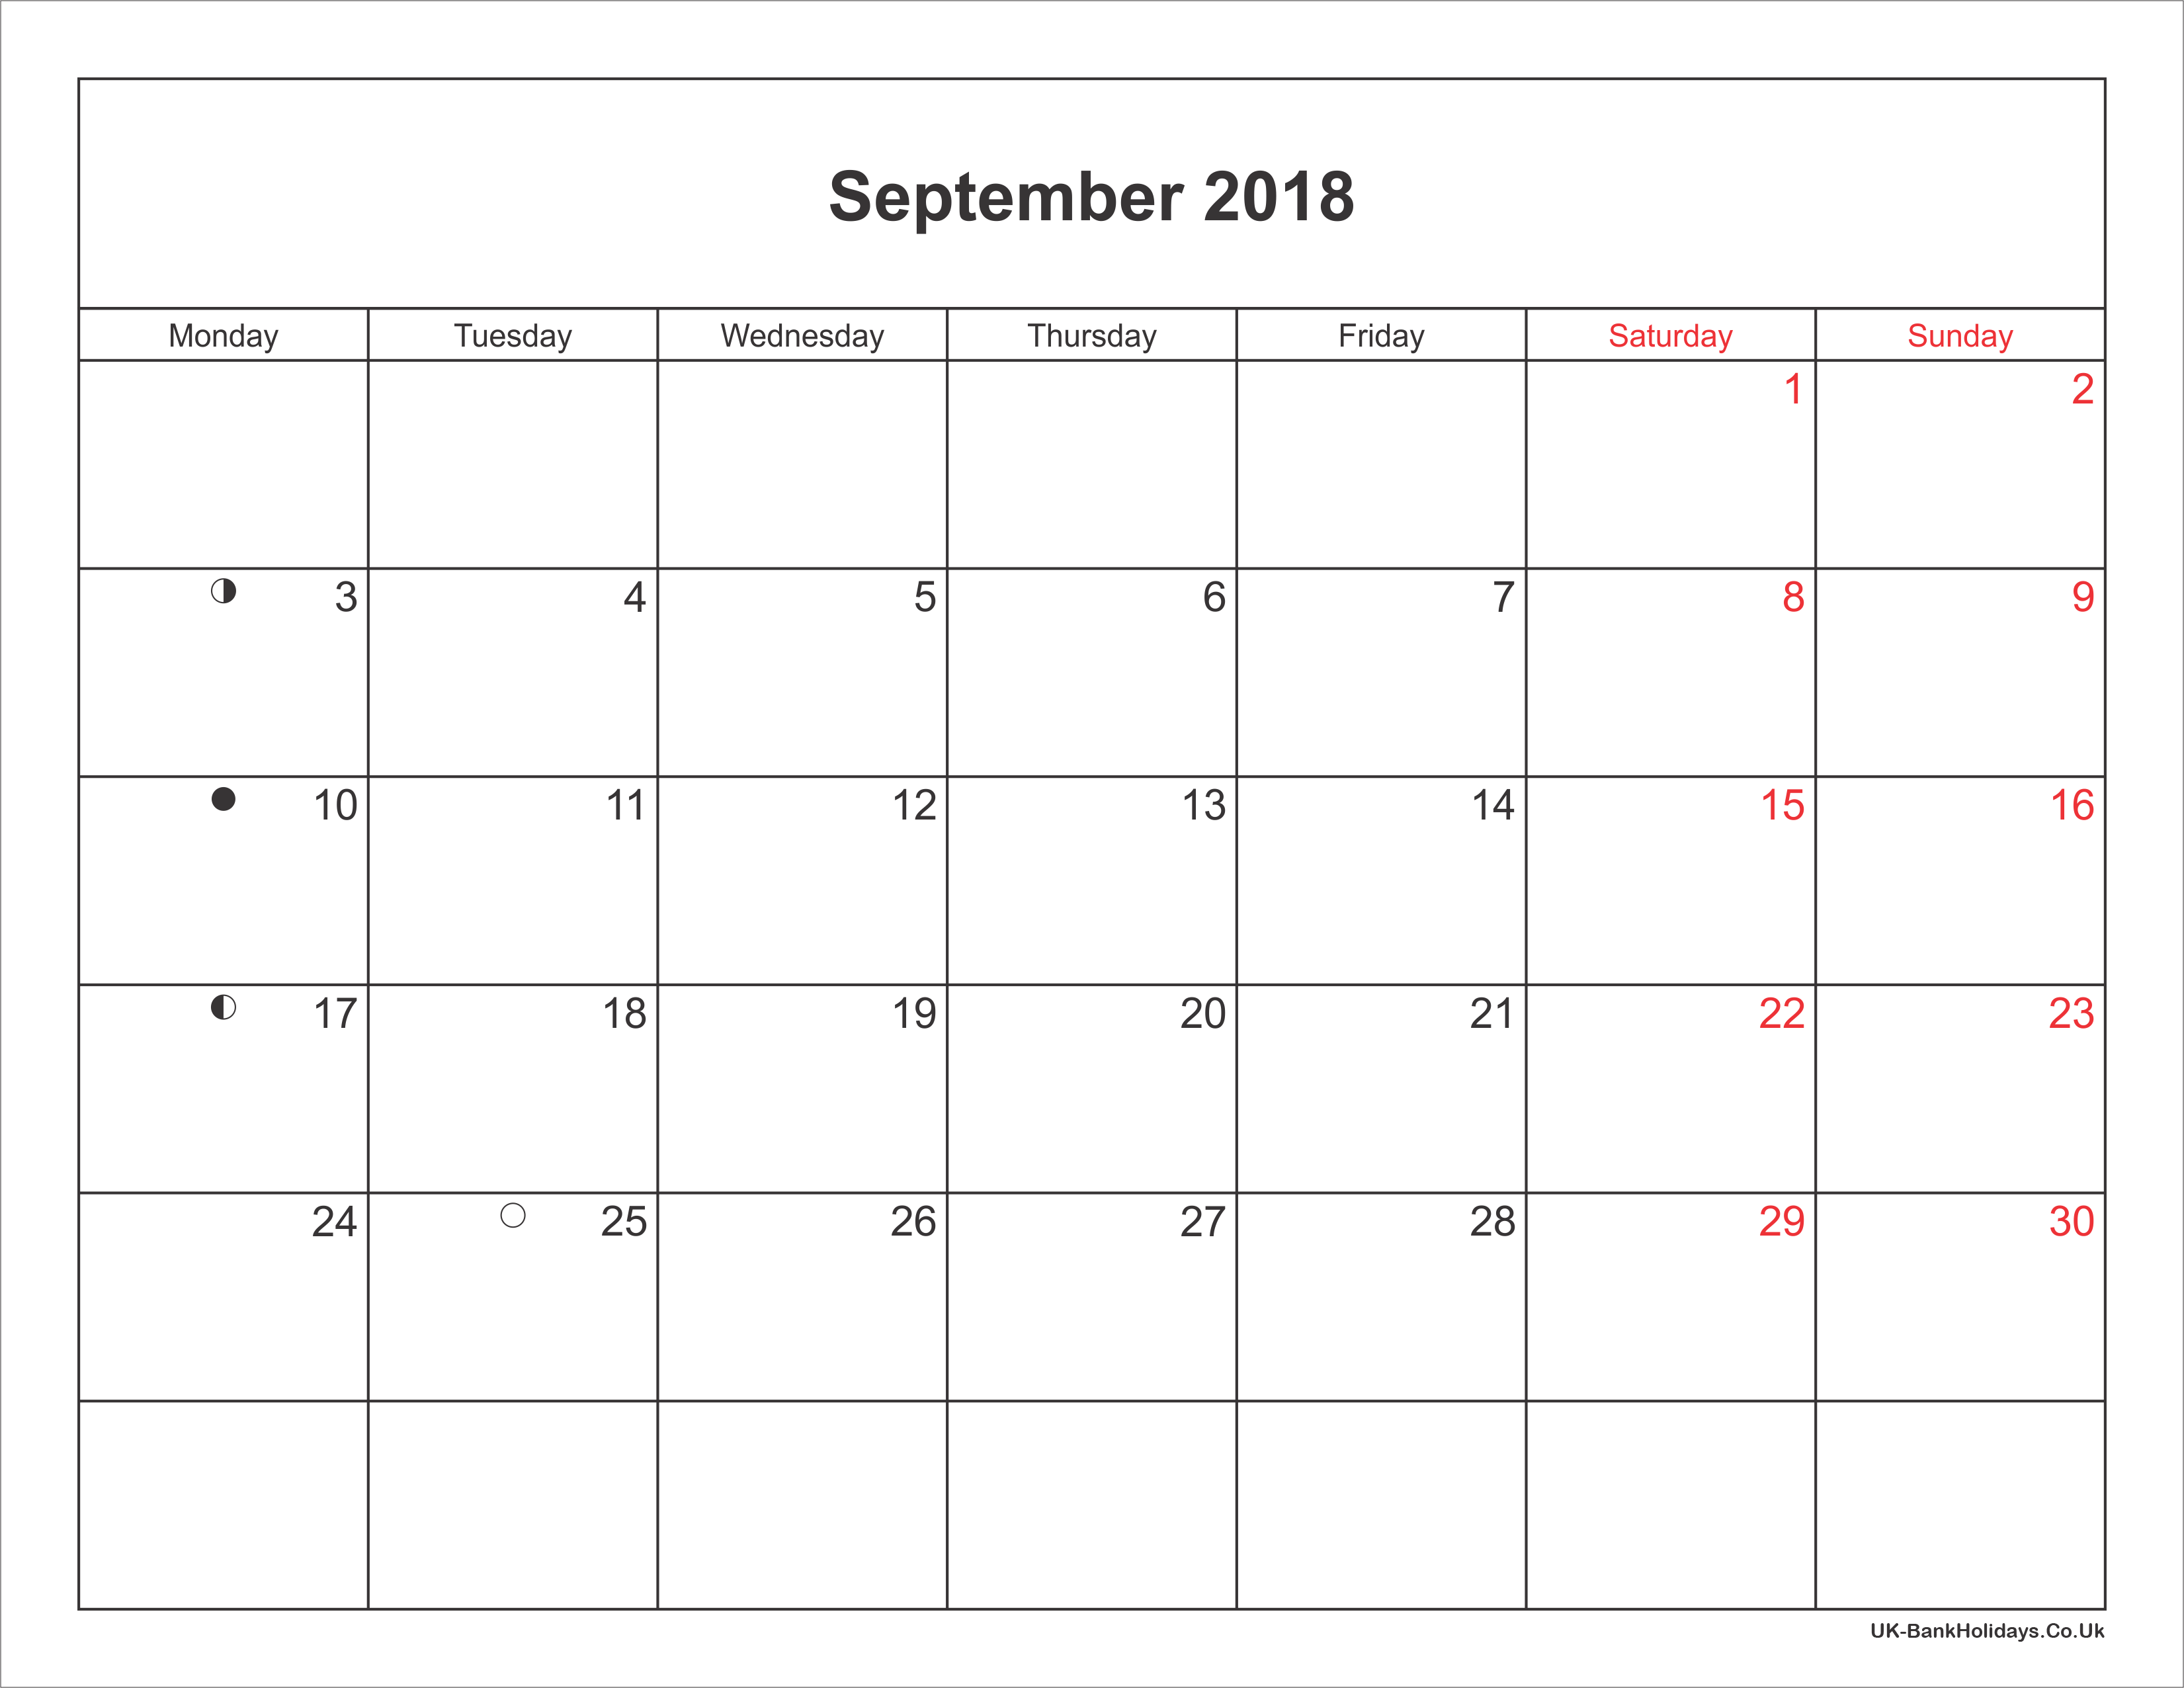 September Calendar 2018 Uk : September calendar printable with bank holidays uk